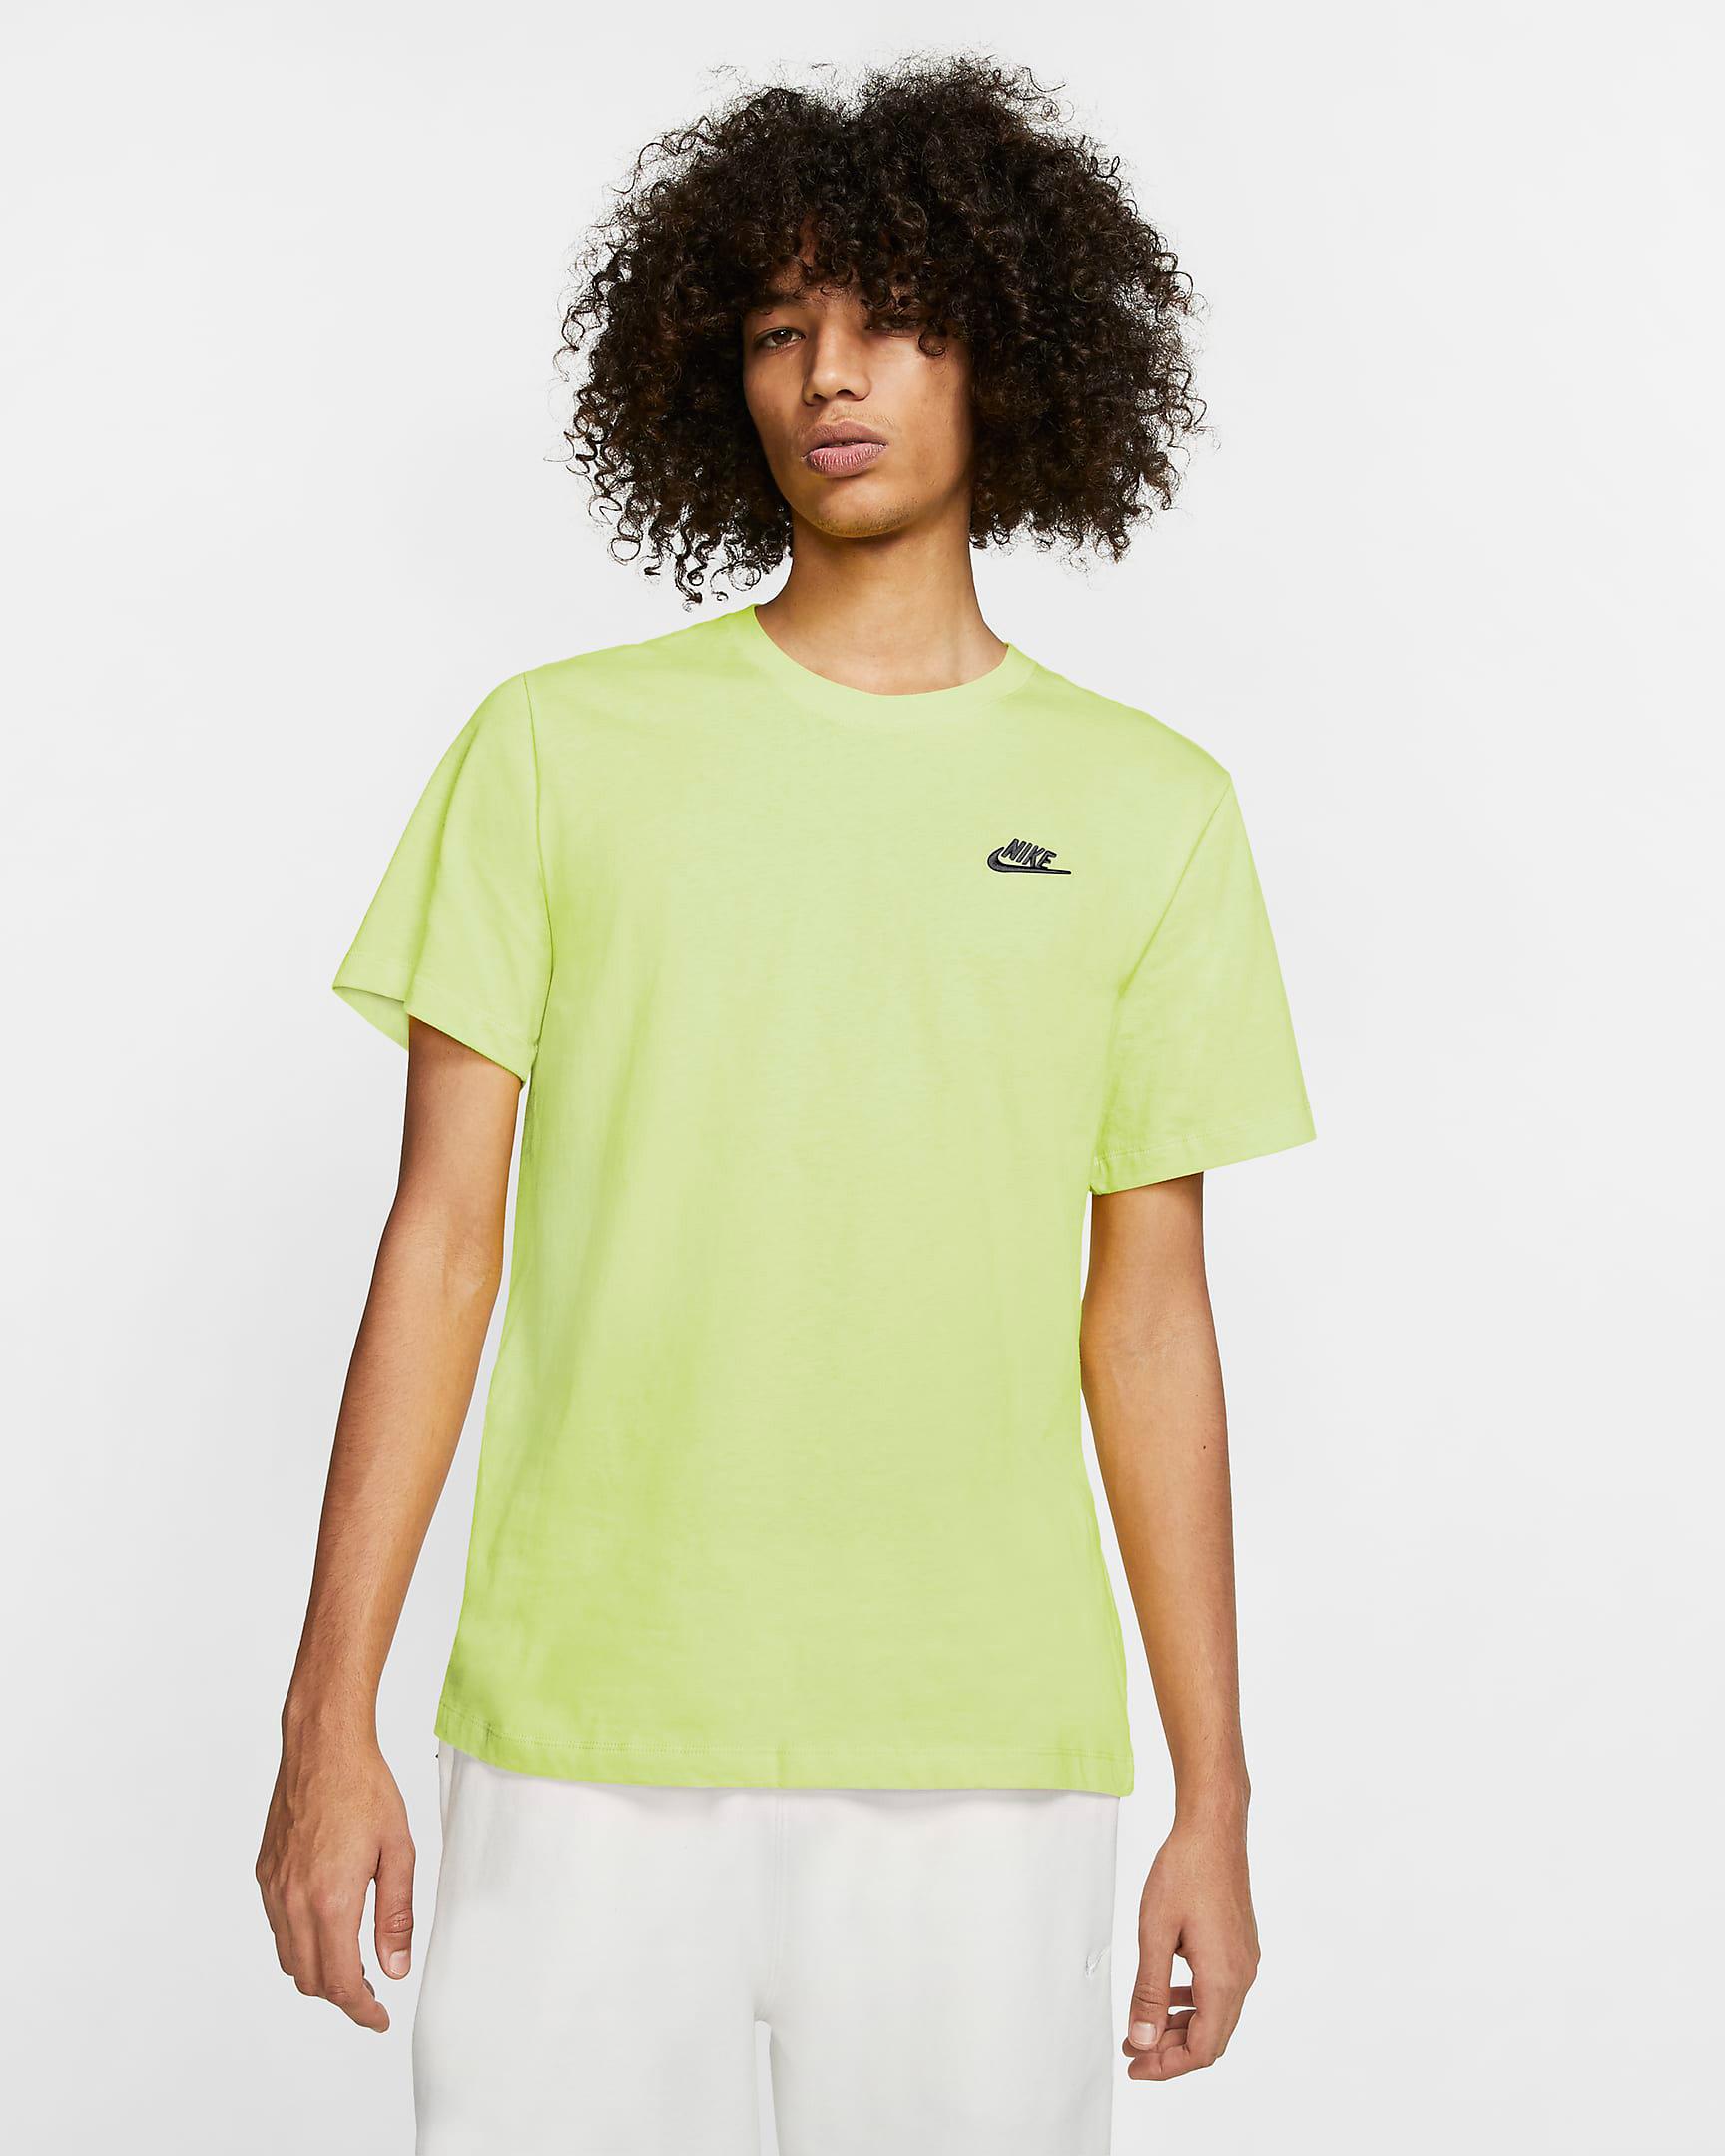 nike-club-t-shirt-neon-yellow-volt